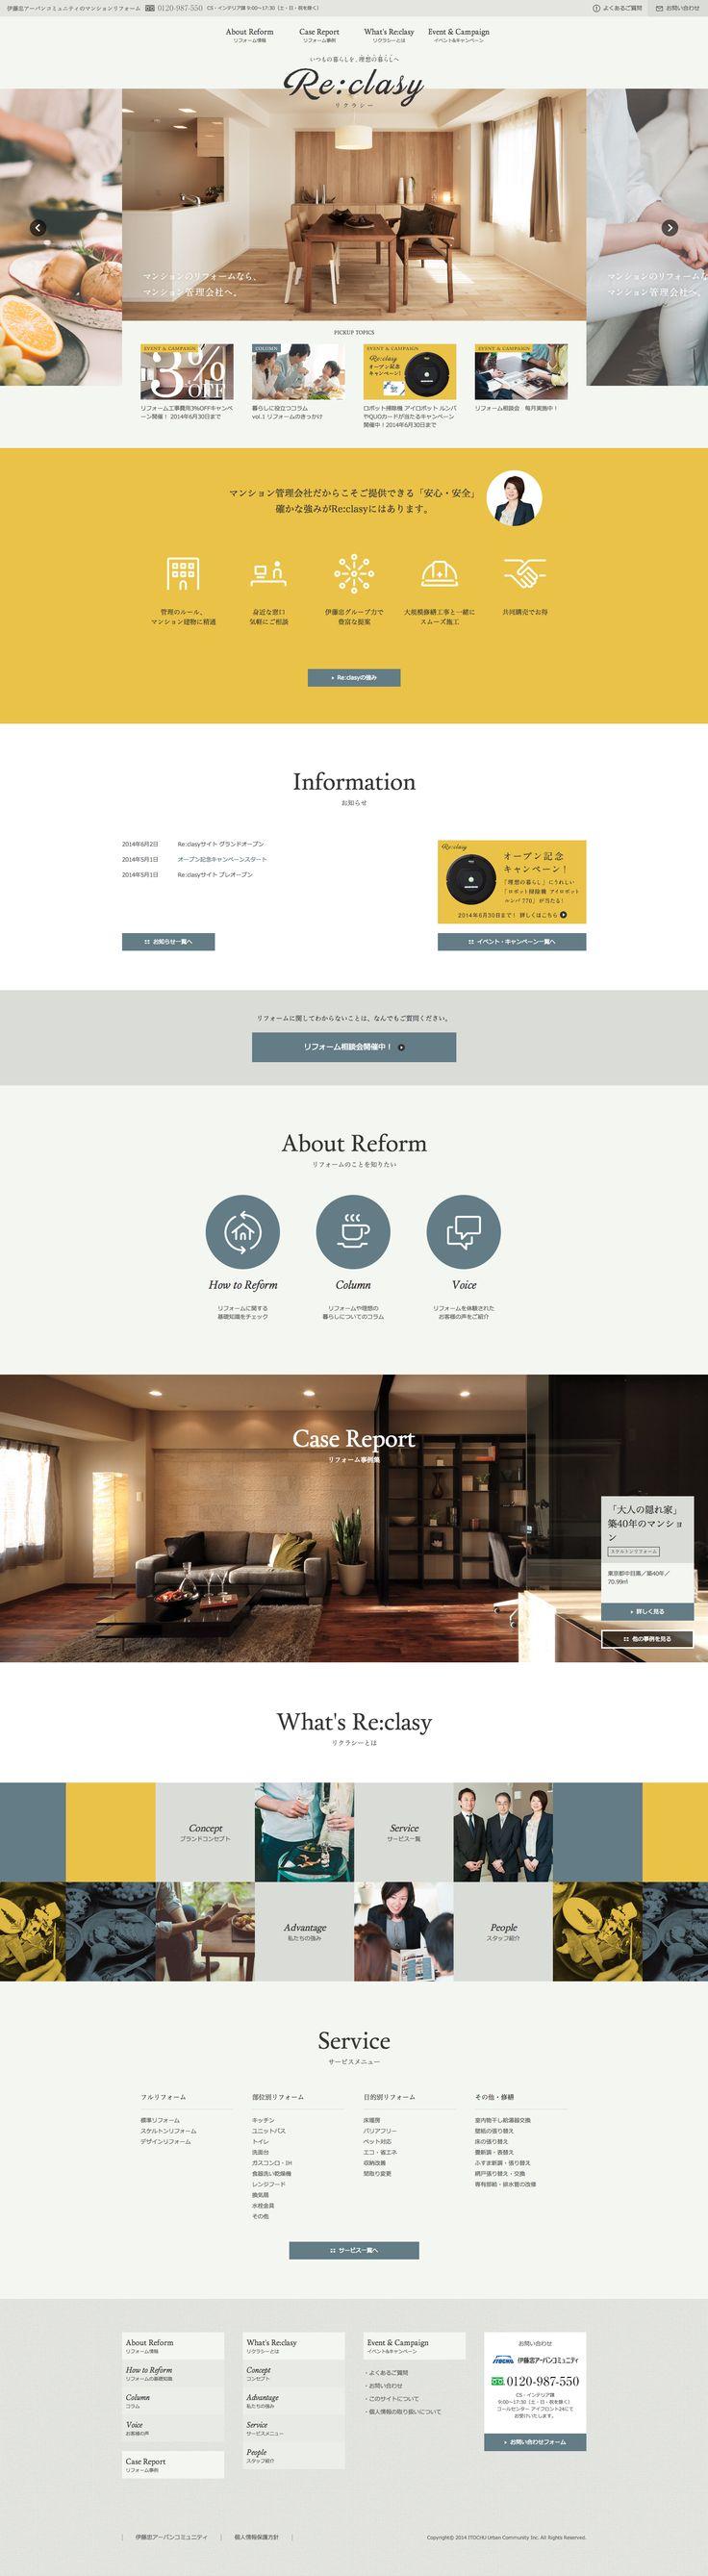 Re:cracy #website #web #webdesign